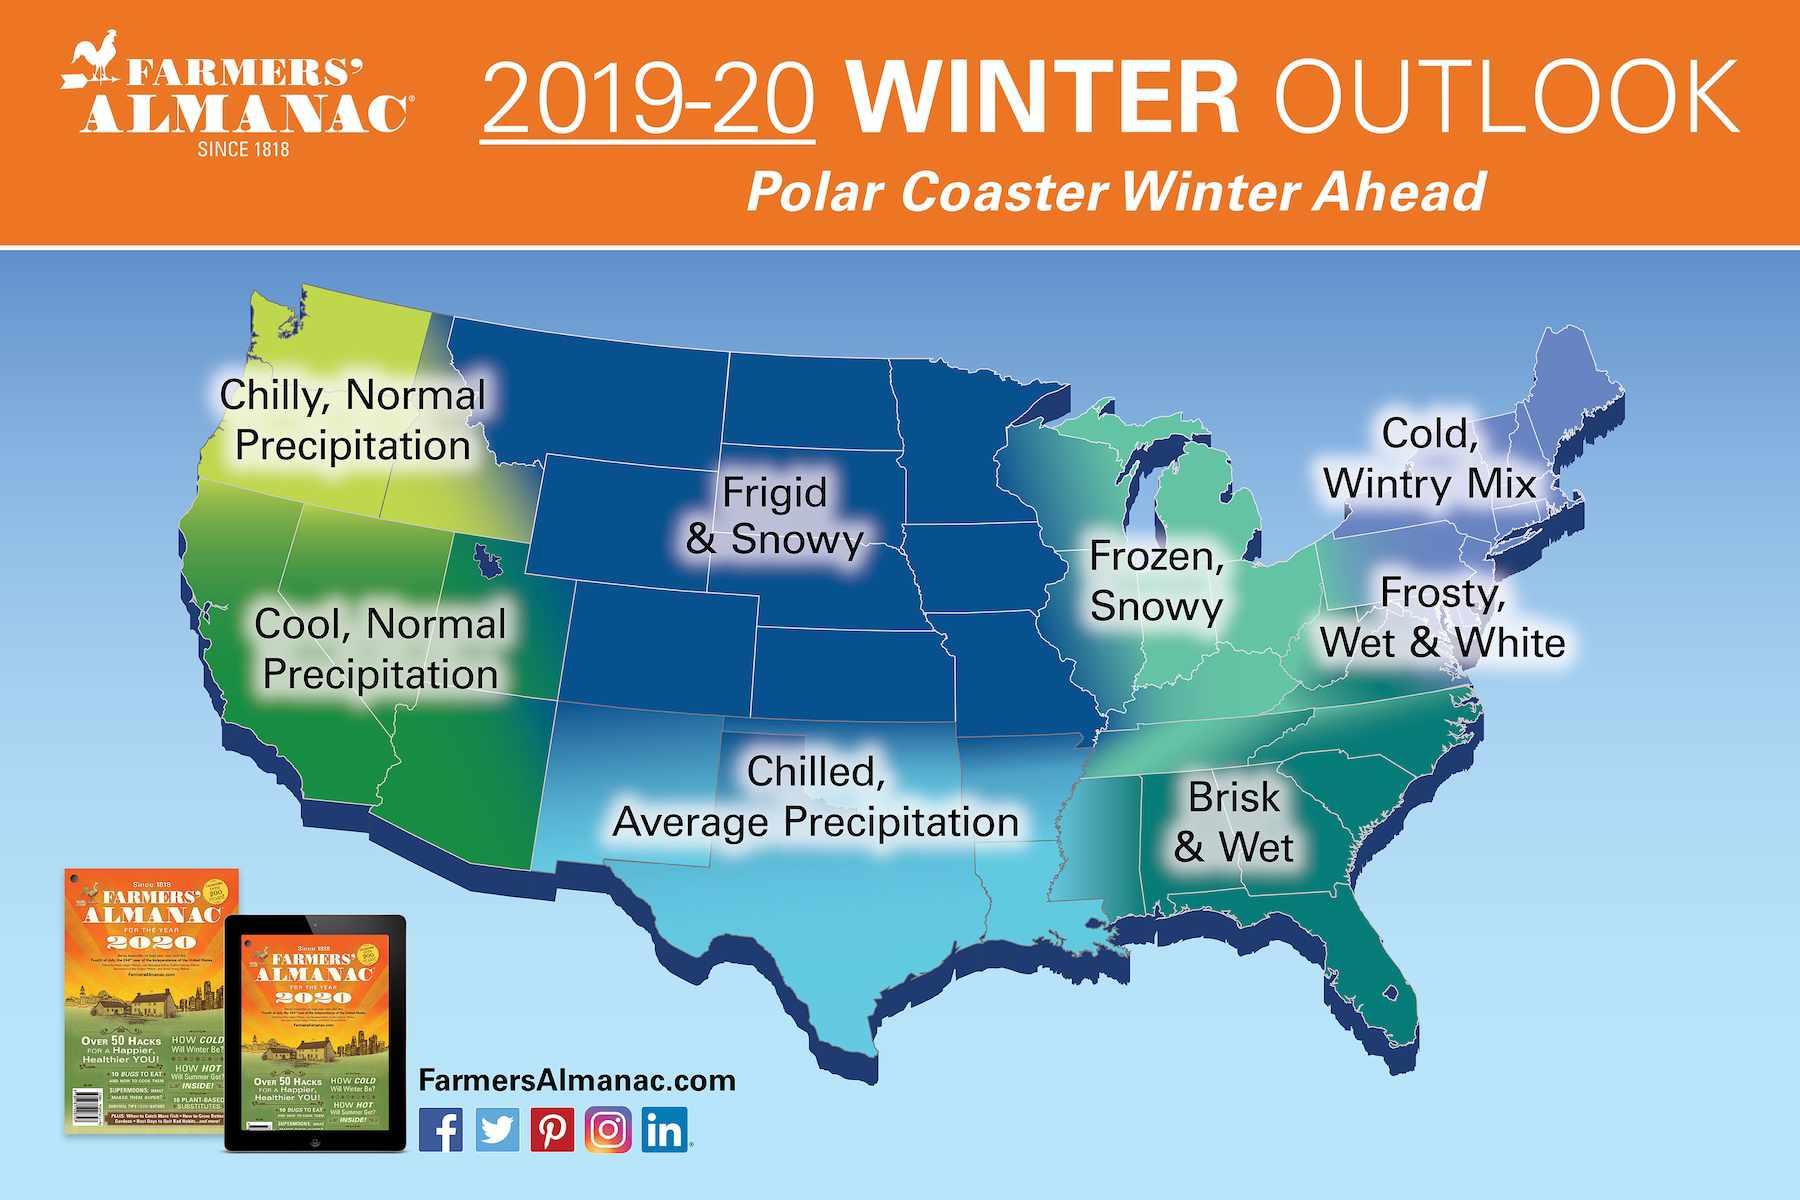 Farmers' Almanac forecast 2019-2020